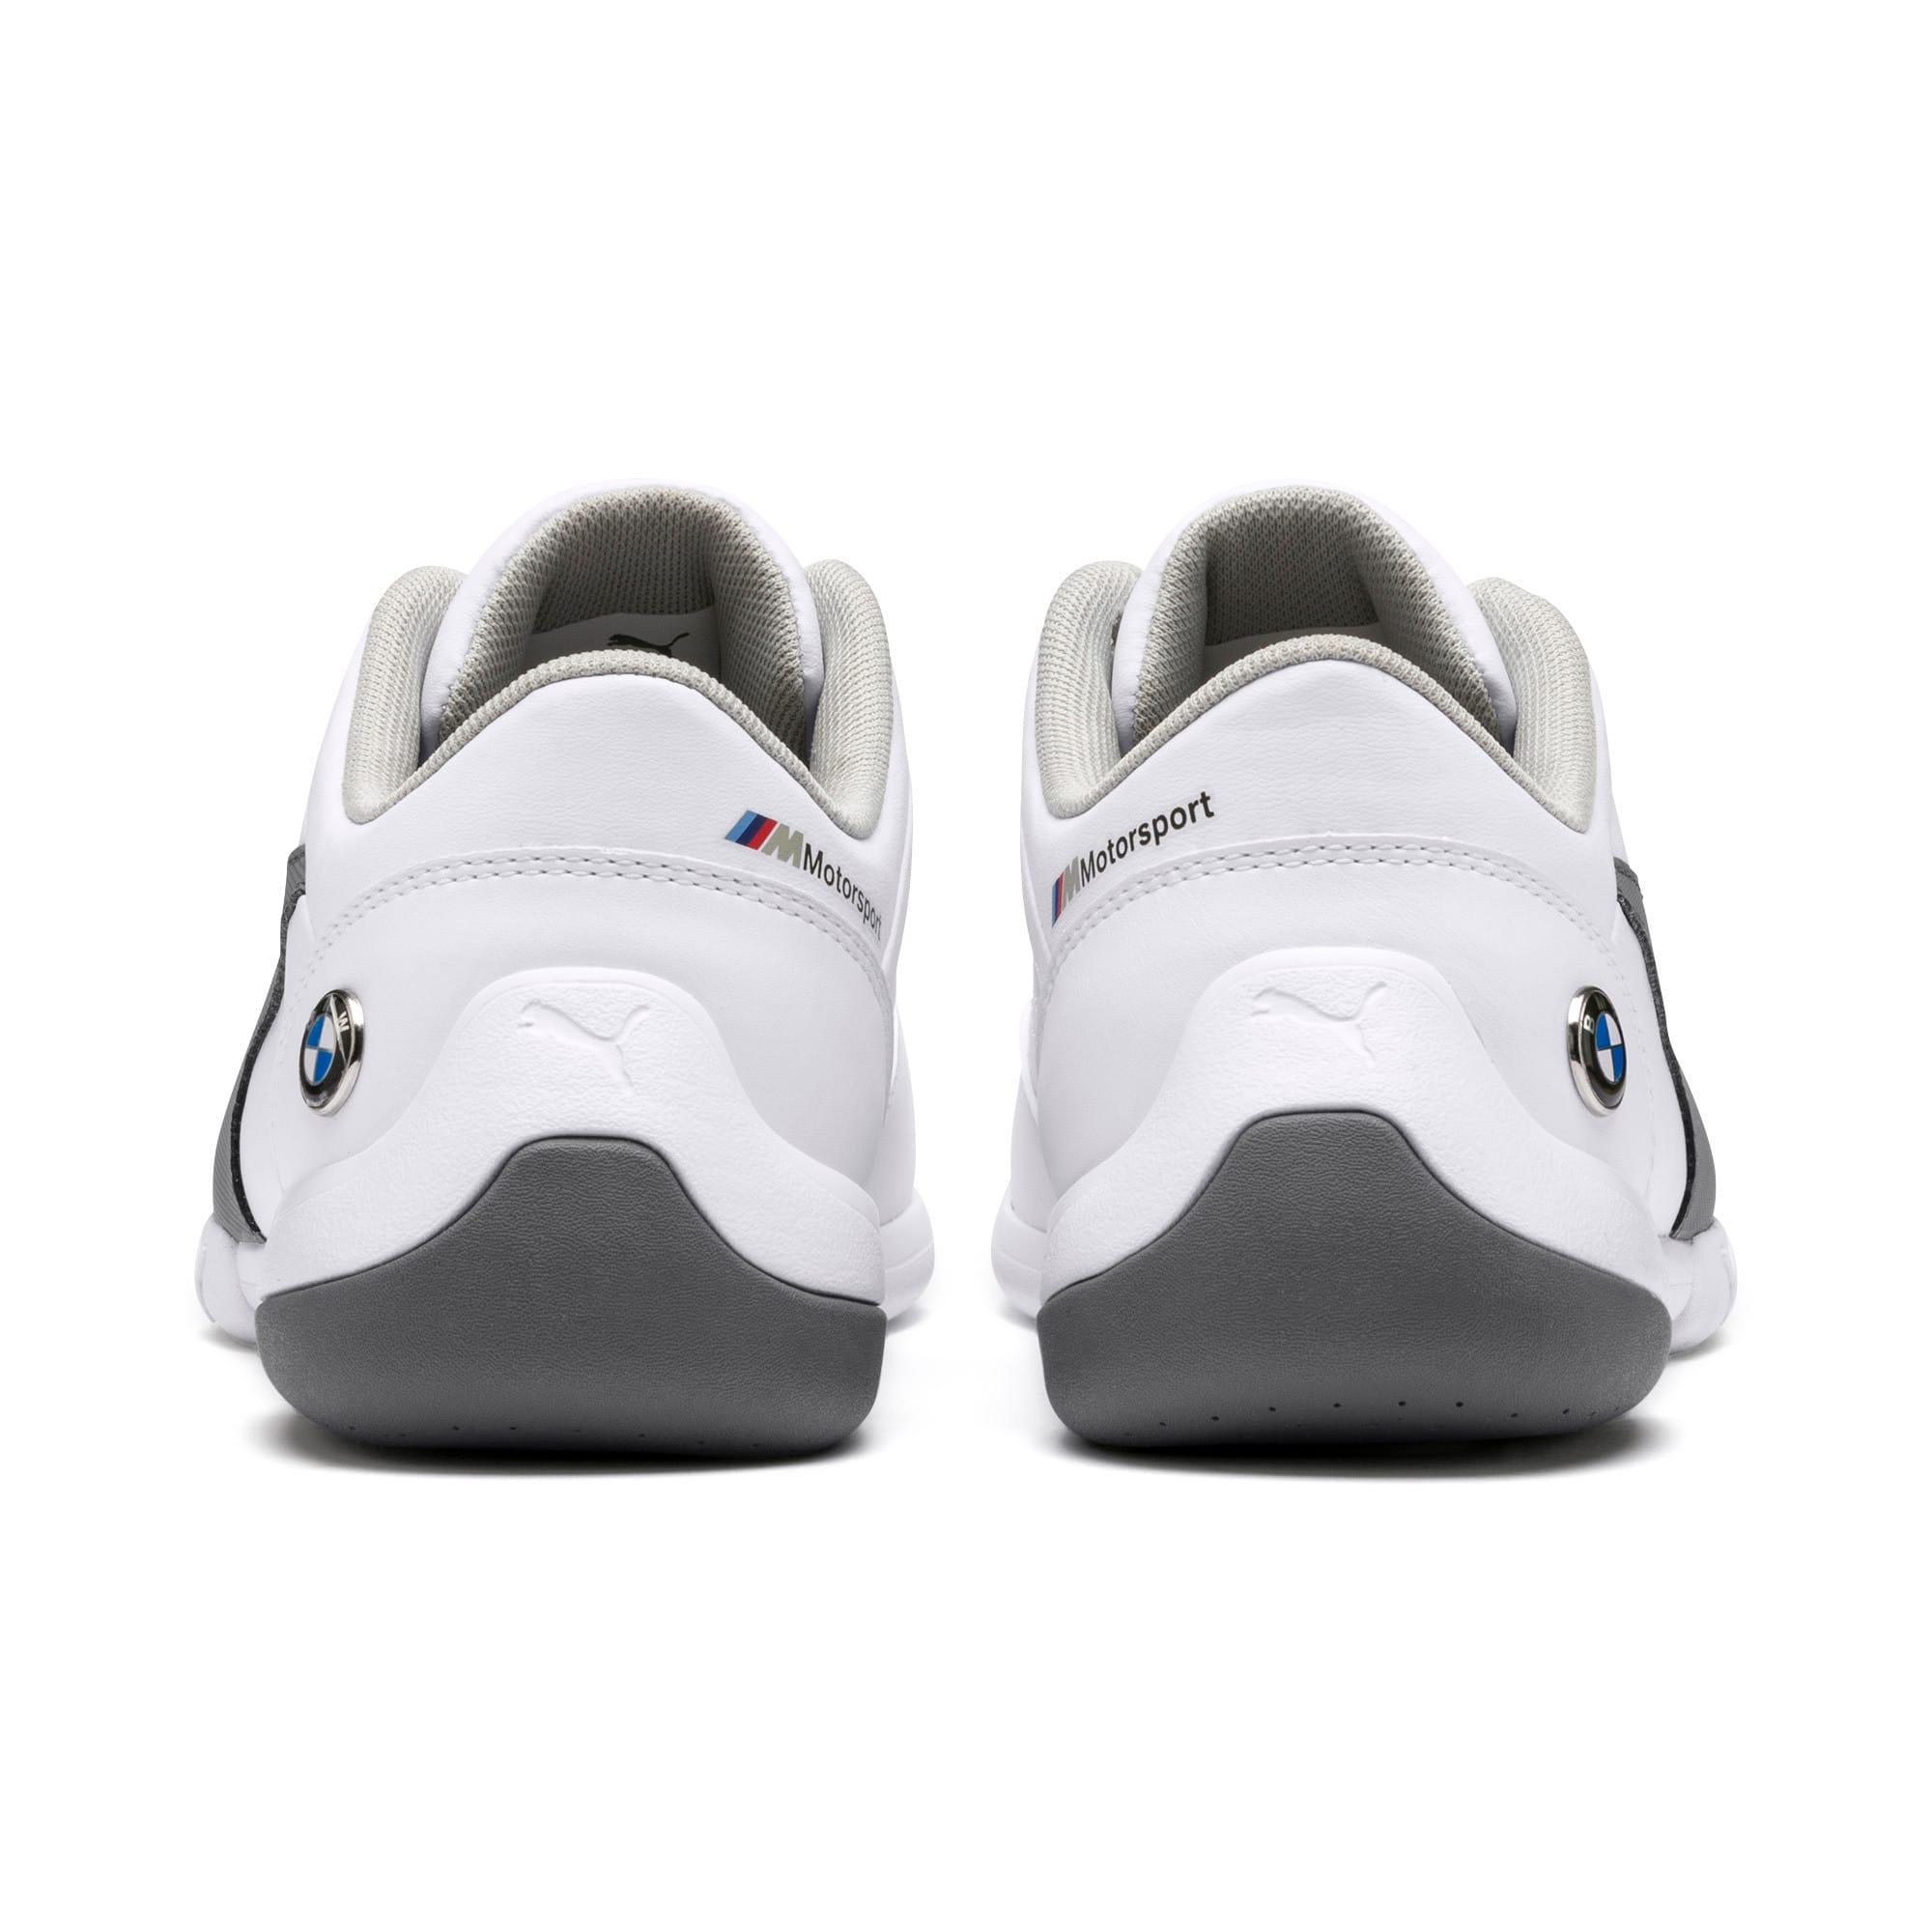 BMW MMS Kart Cat III Shoes JR